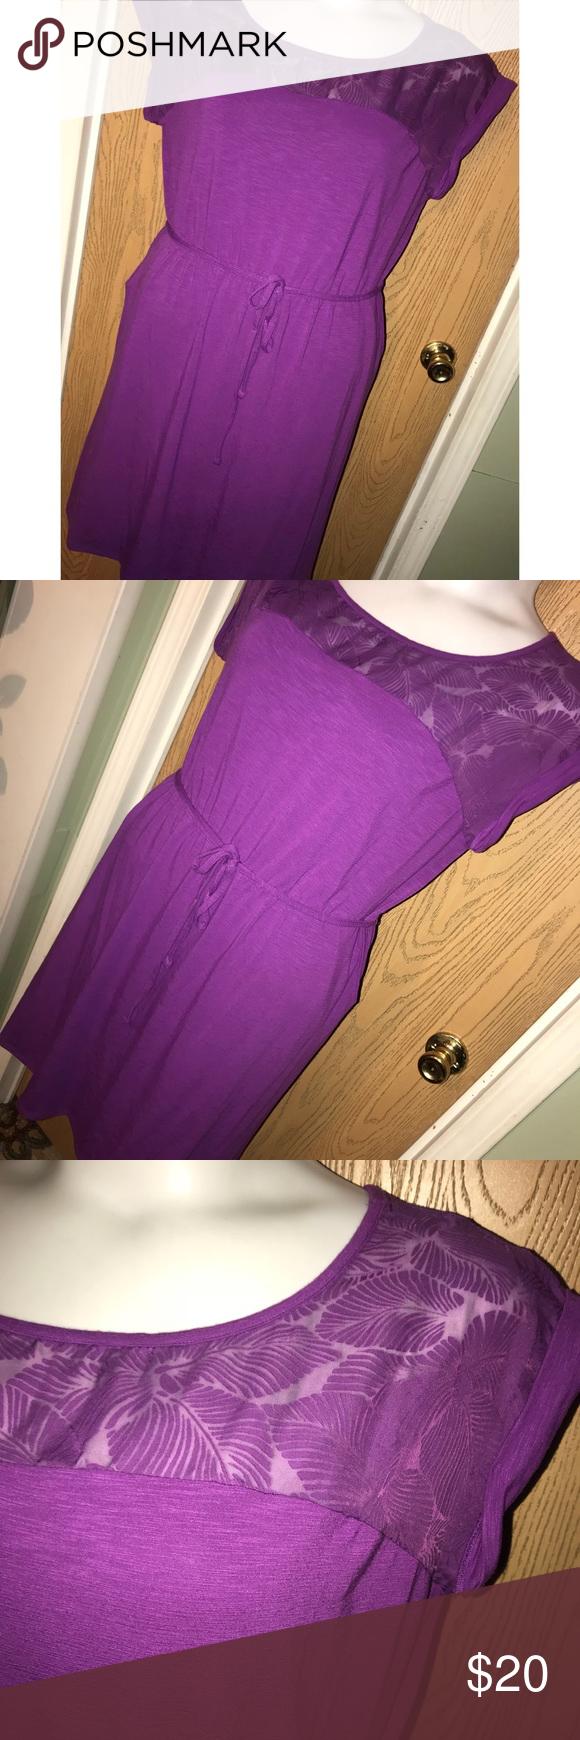 Purple mesh leaf top dress Super cute purple mesh leaf top